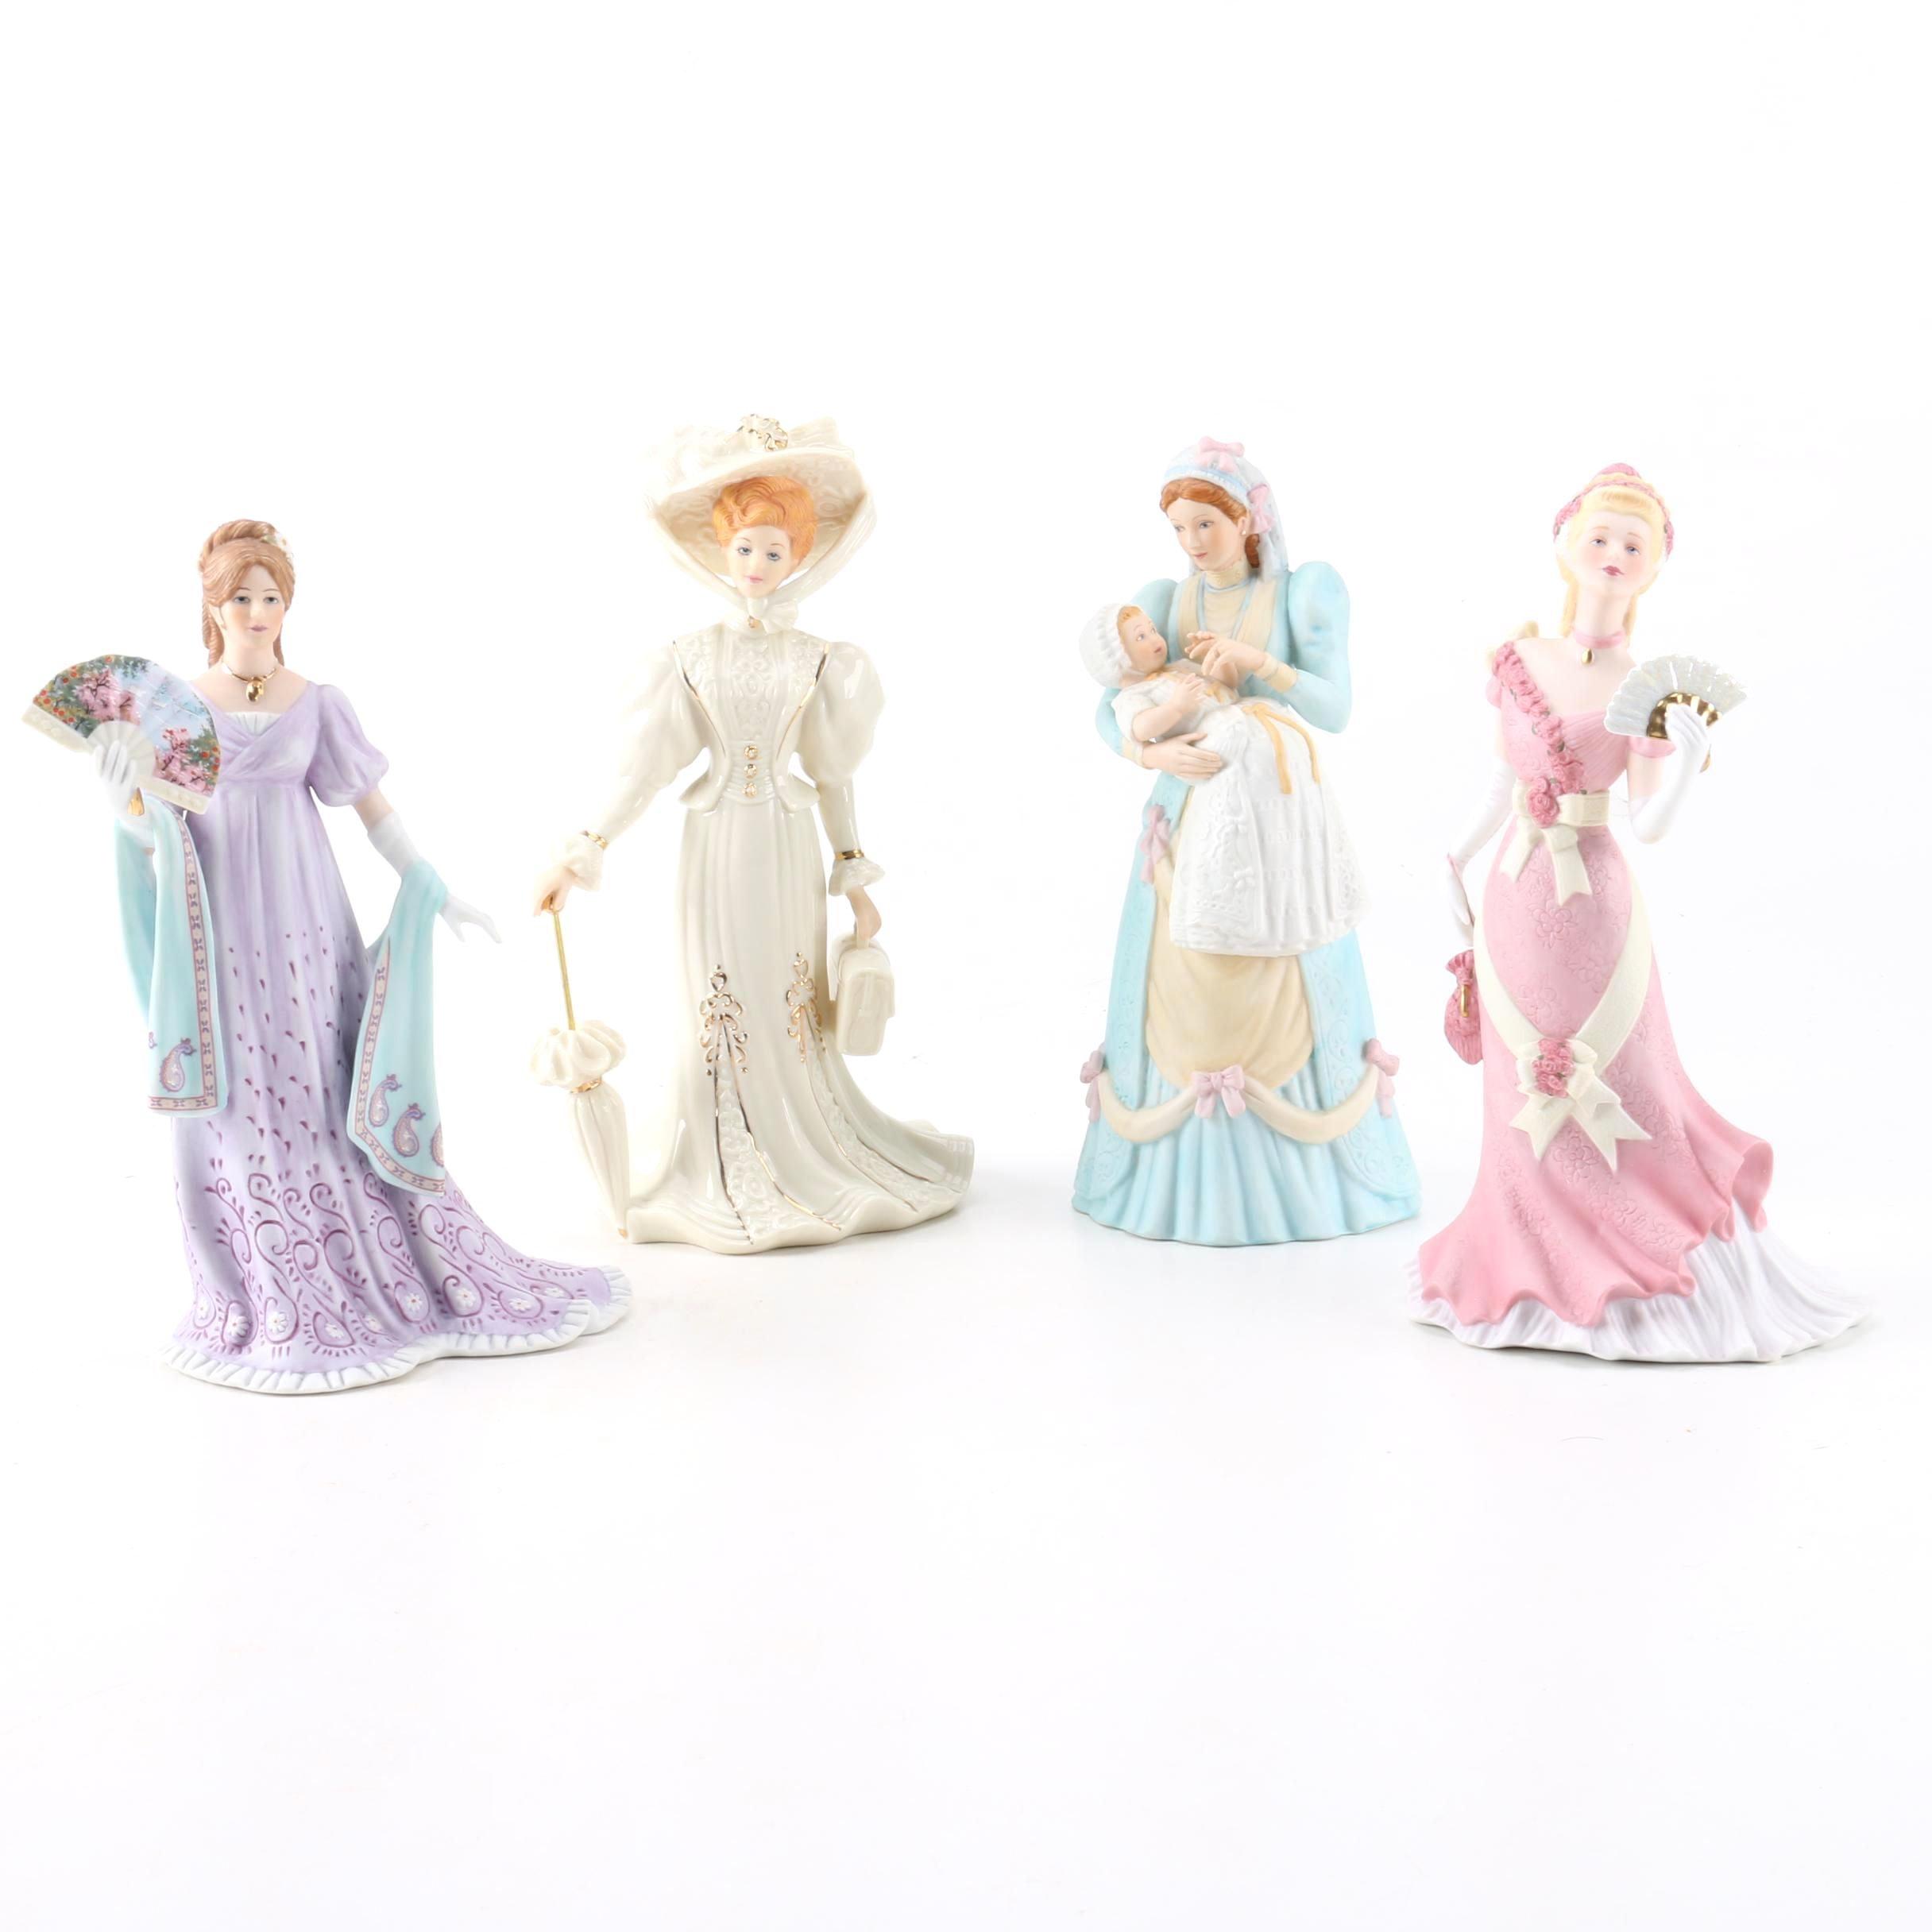 Vintage Lenox Hand-Painted Porcelain Figurines